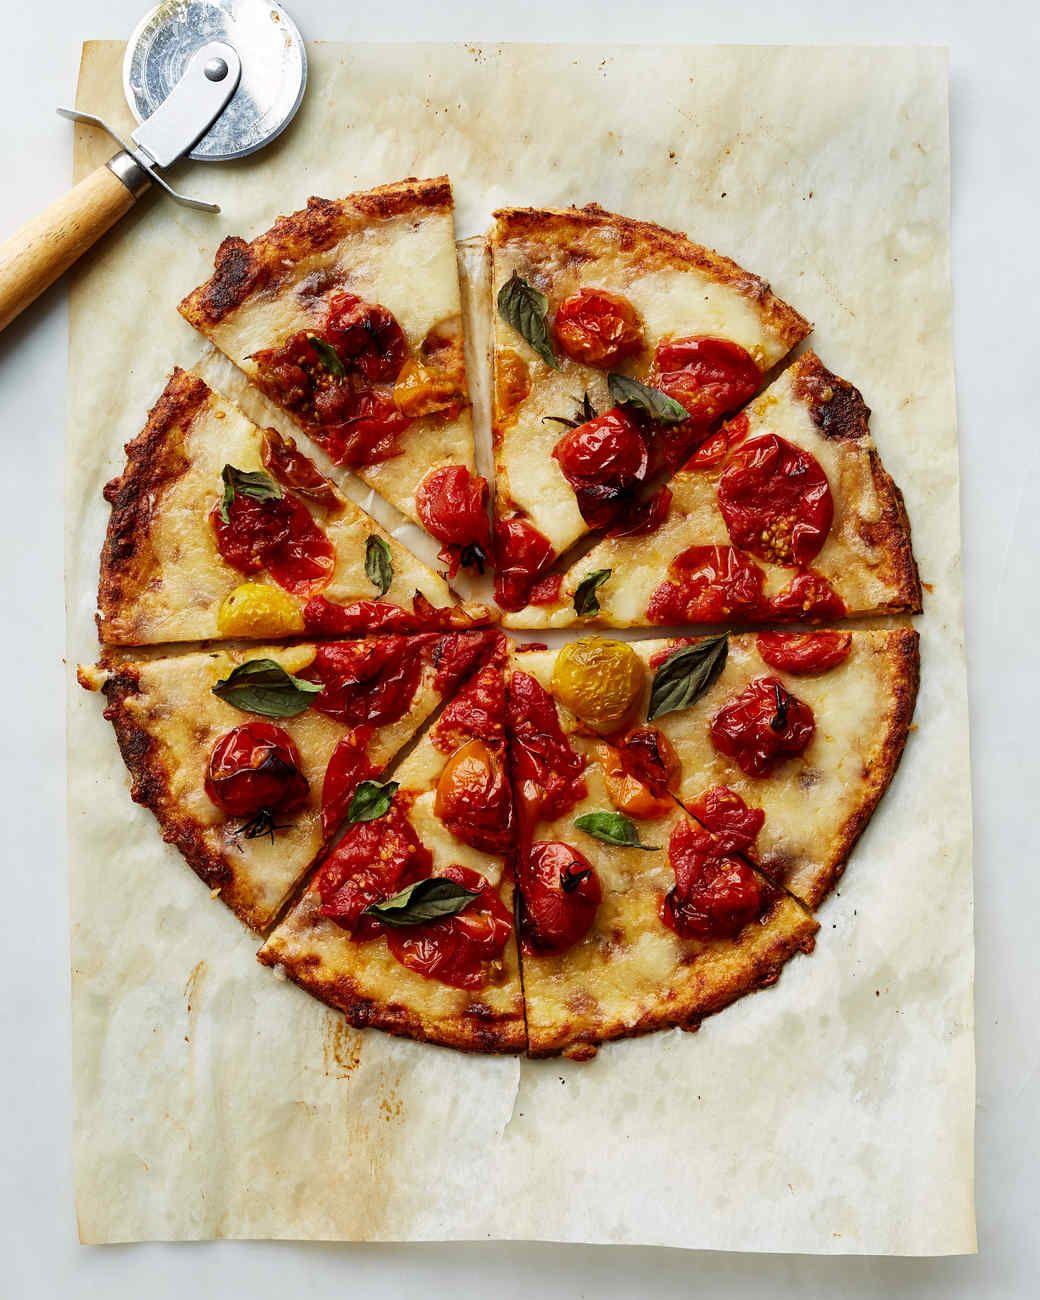 Groß Crust Pizza Küche Ideen - Küche Set Ideen - deriherusweets.info